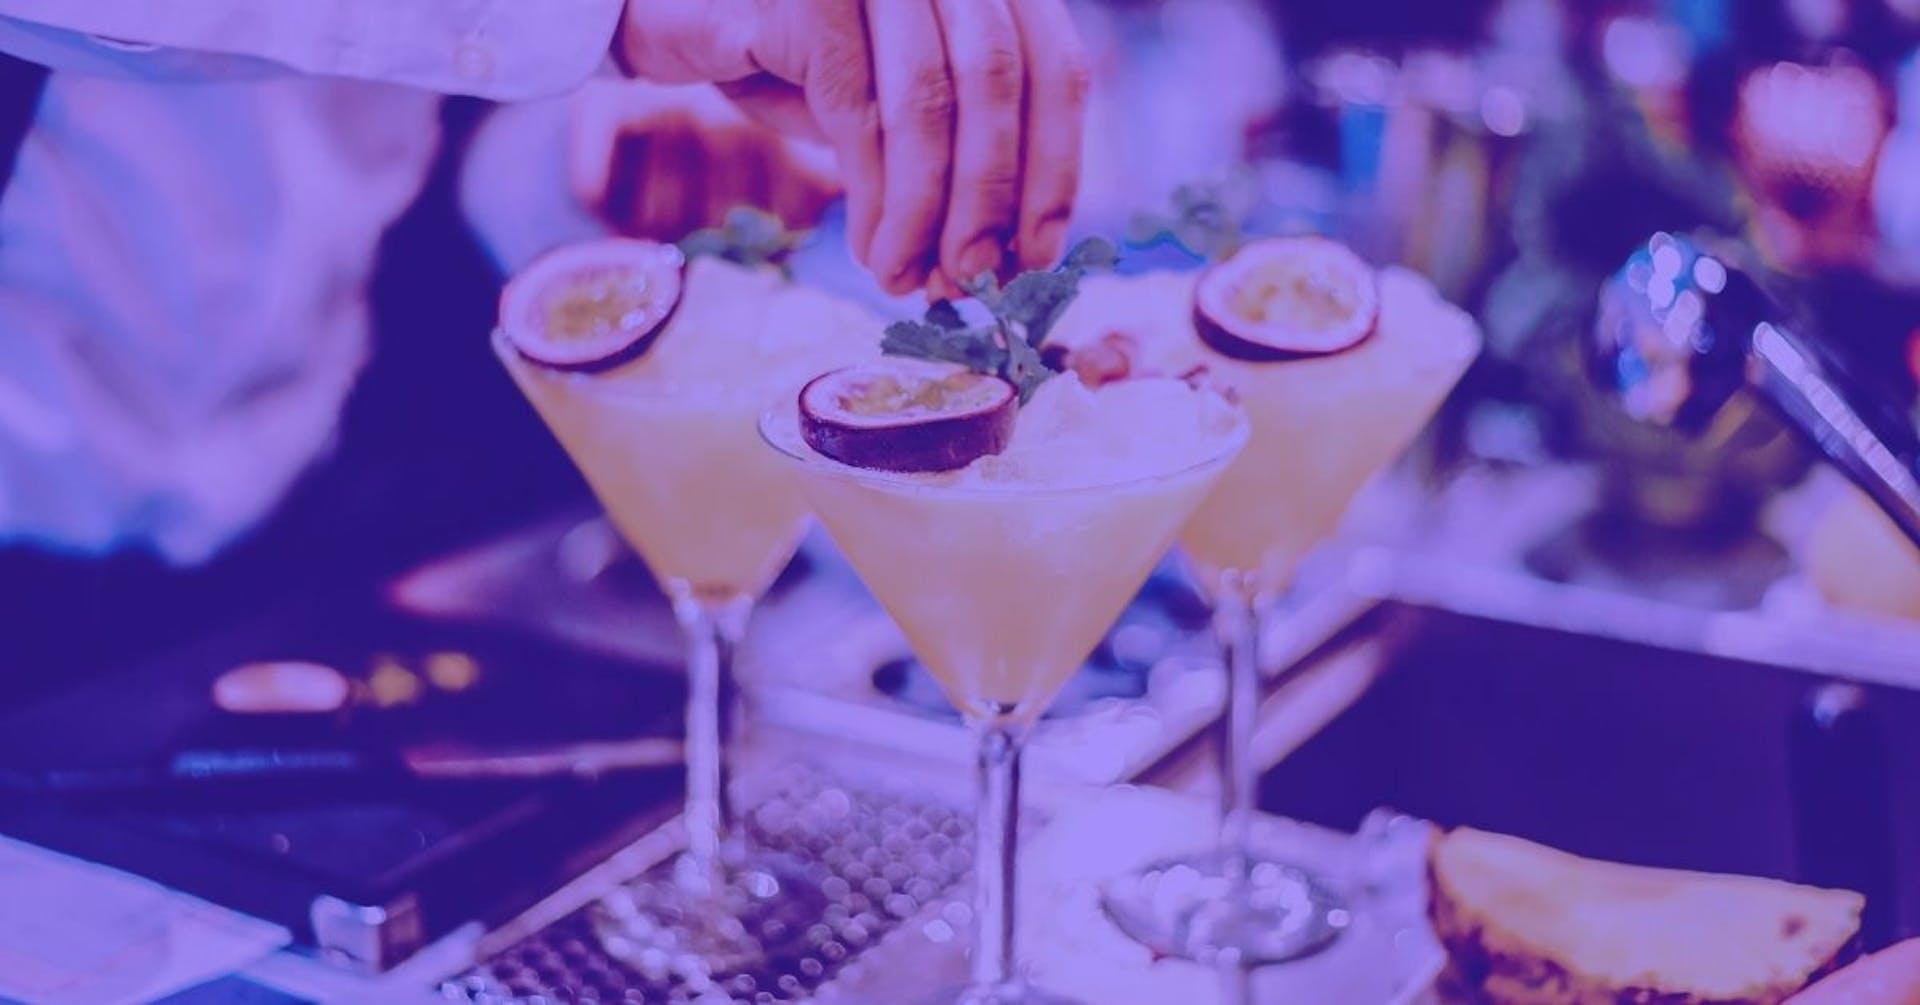 Cócteles con mezcal que debes probar para disfrutar de la gastronomía mexicana